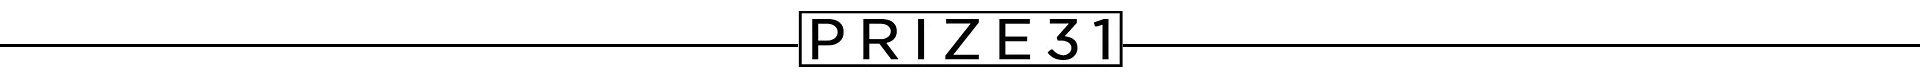 prize31-logo-fullwidth